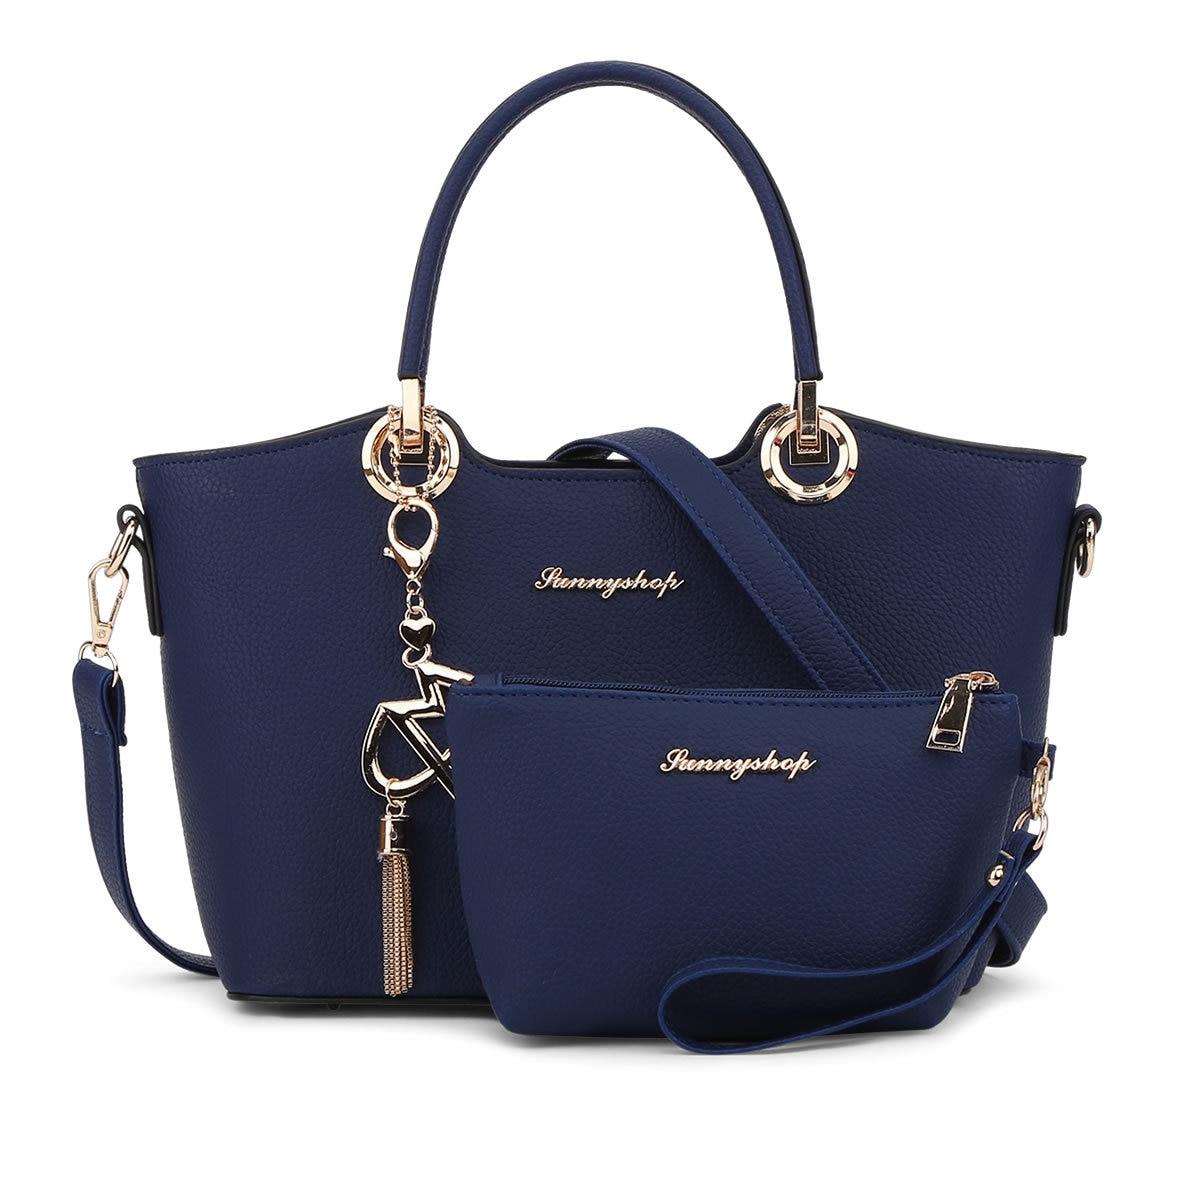 2 Bags/set 2017 Fashion Women Leather s